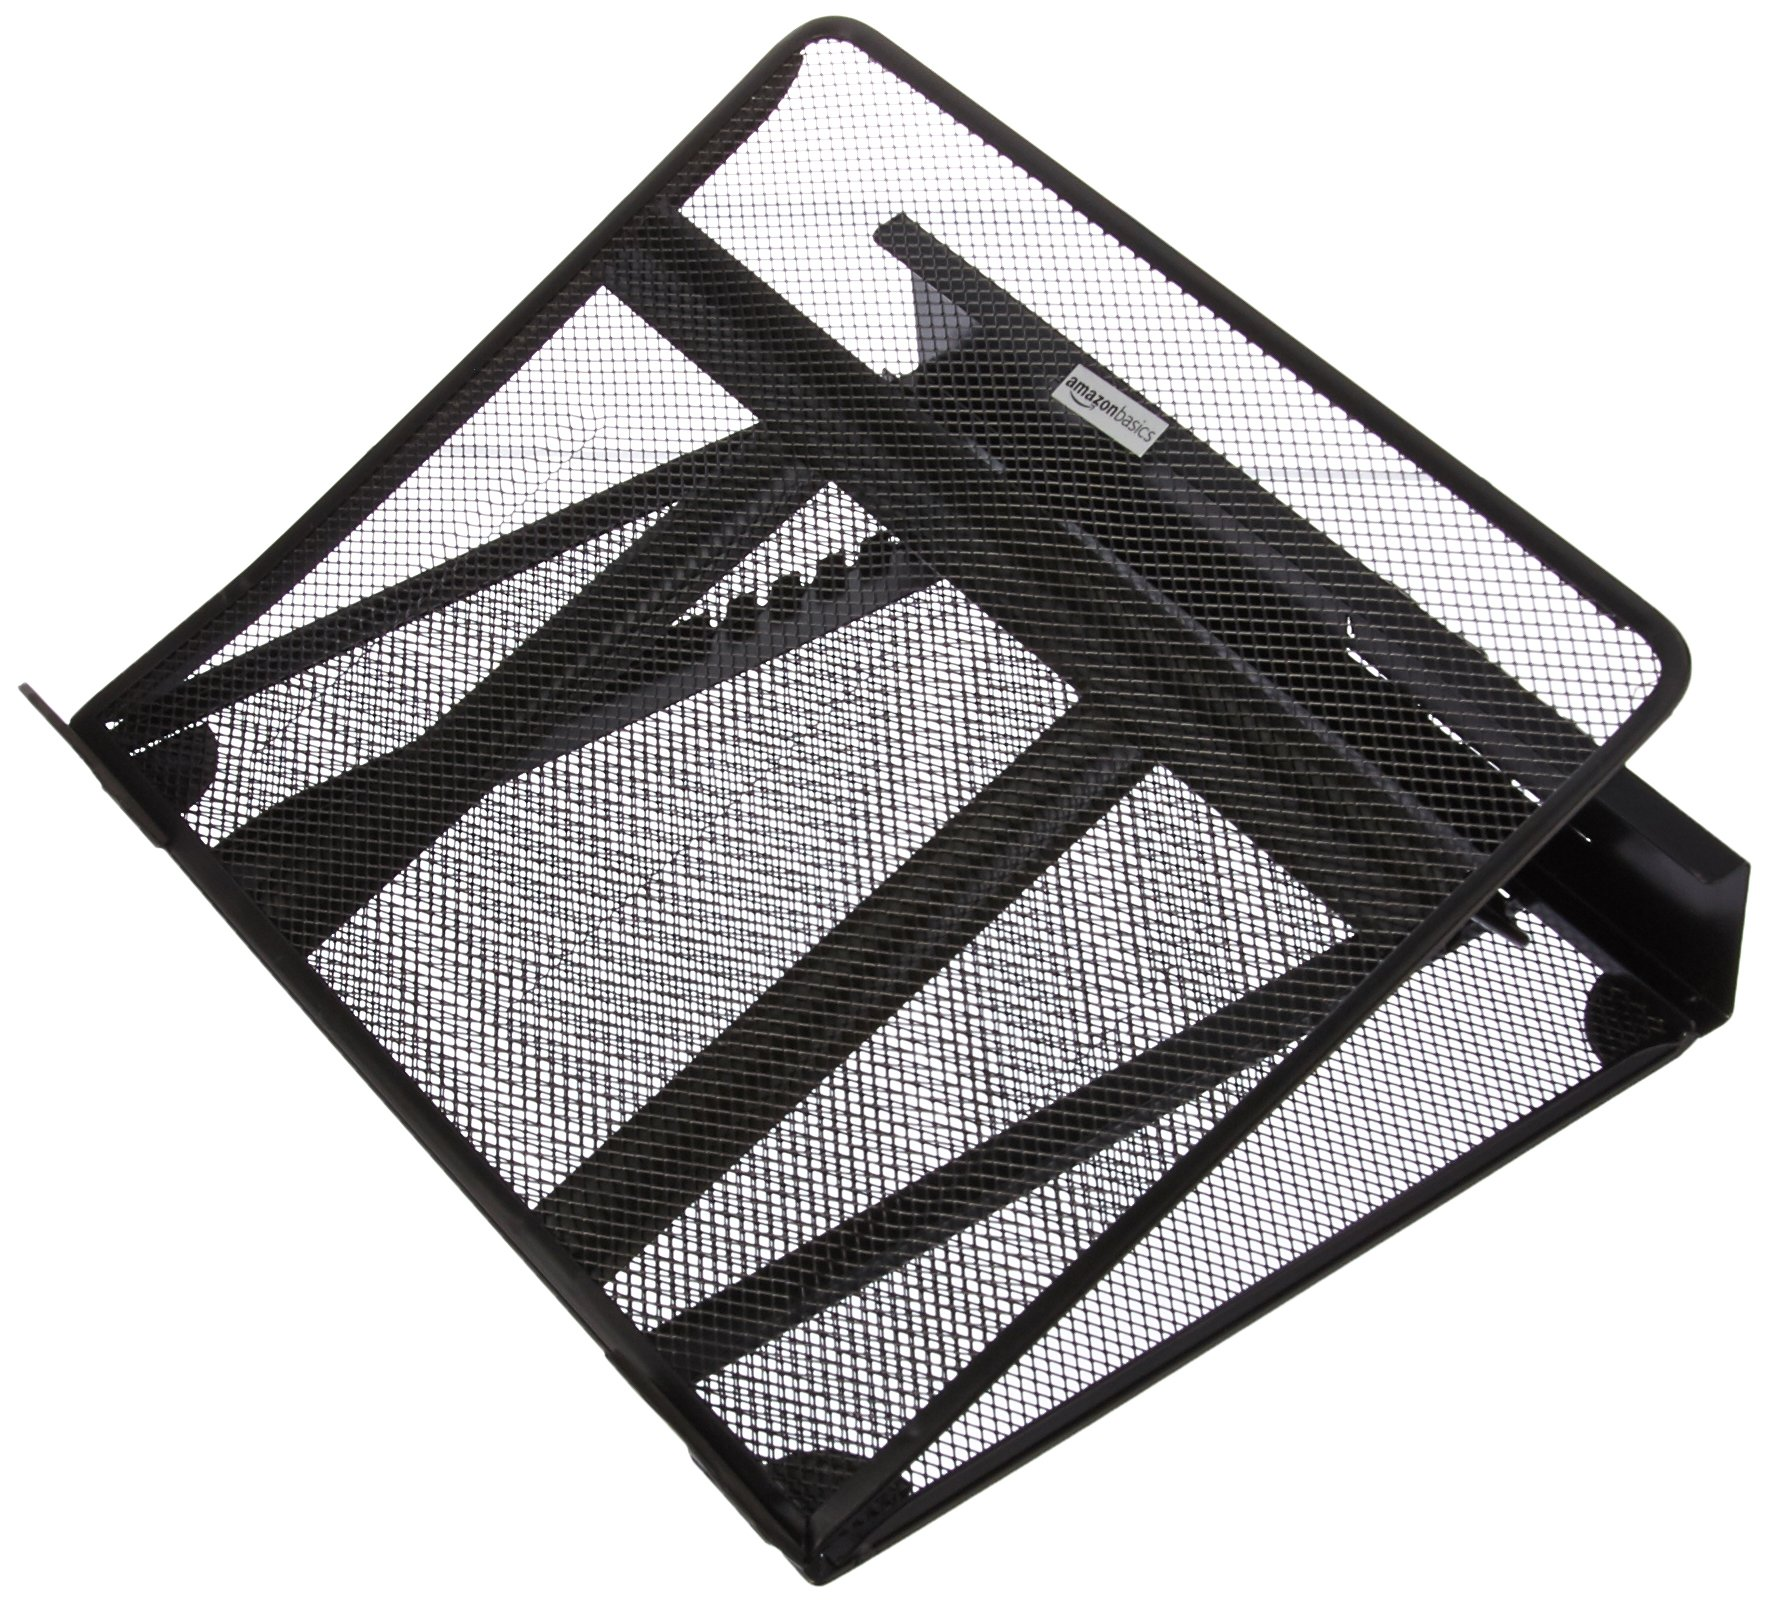 AmazonBasics Ventilated Laptop Stand (Black) product image